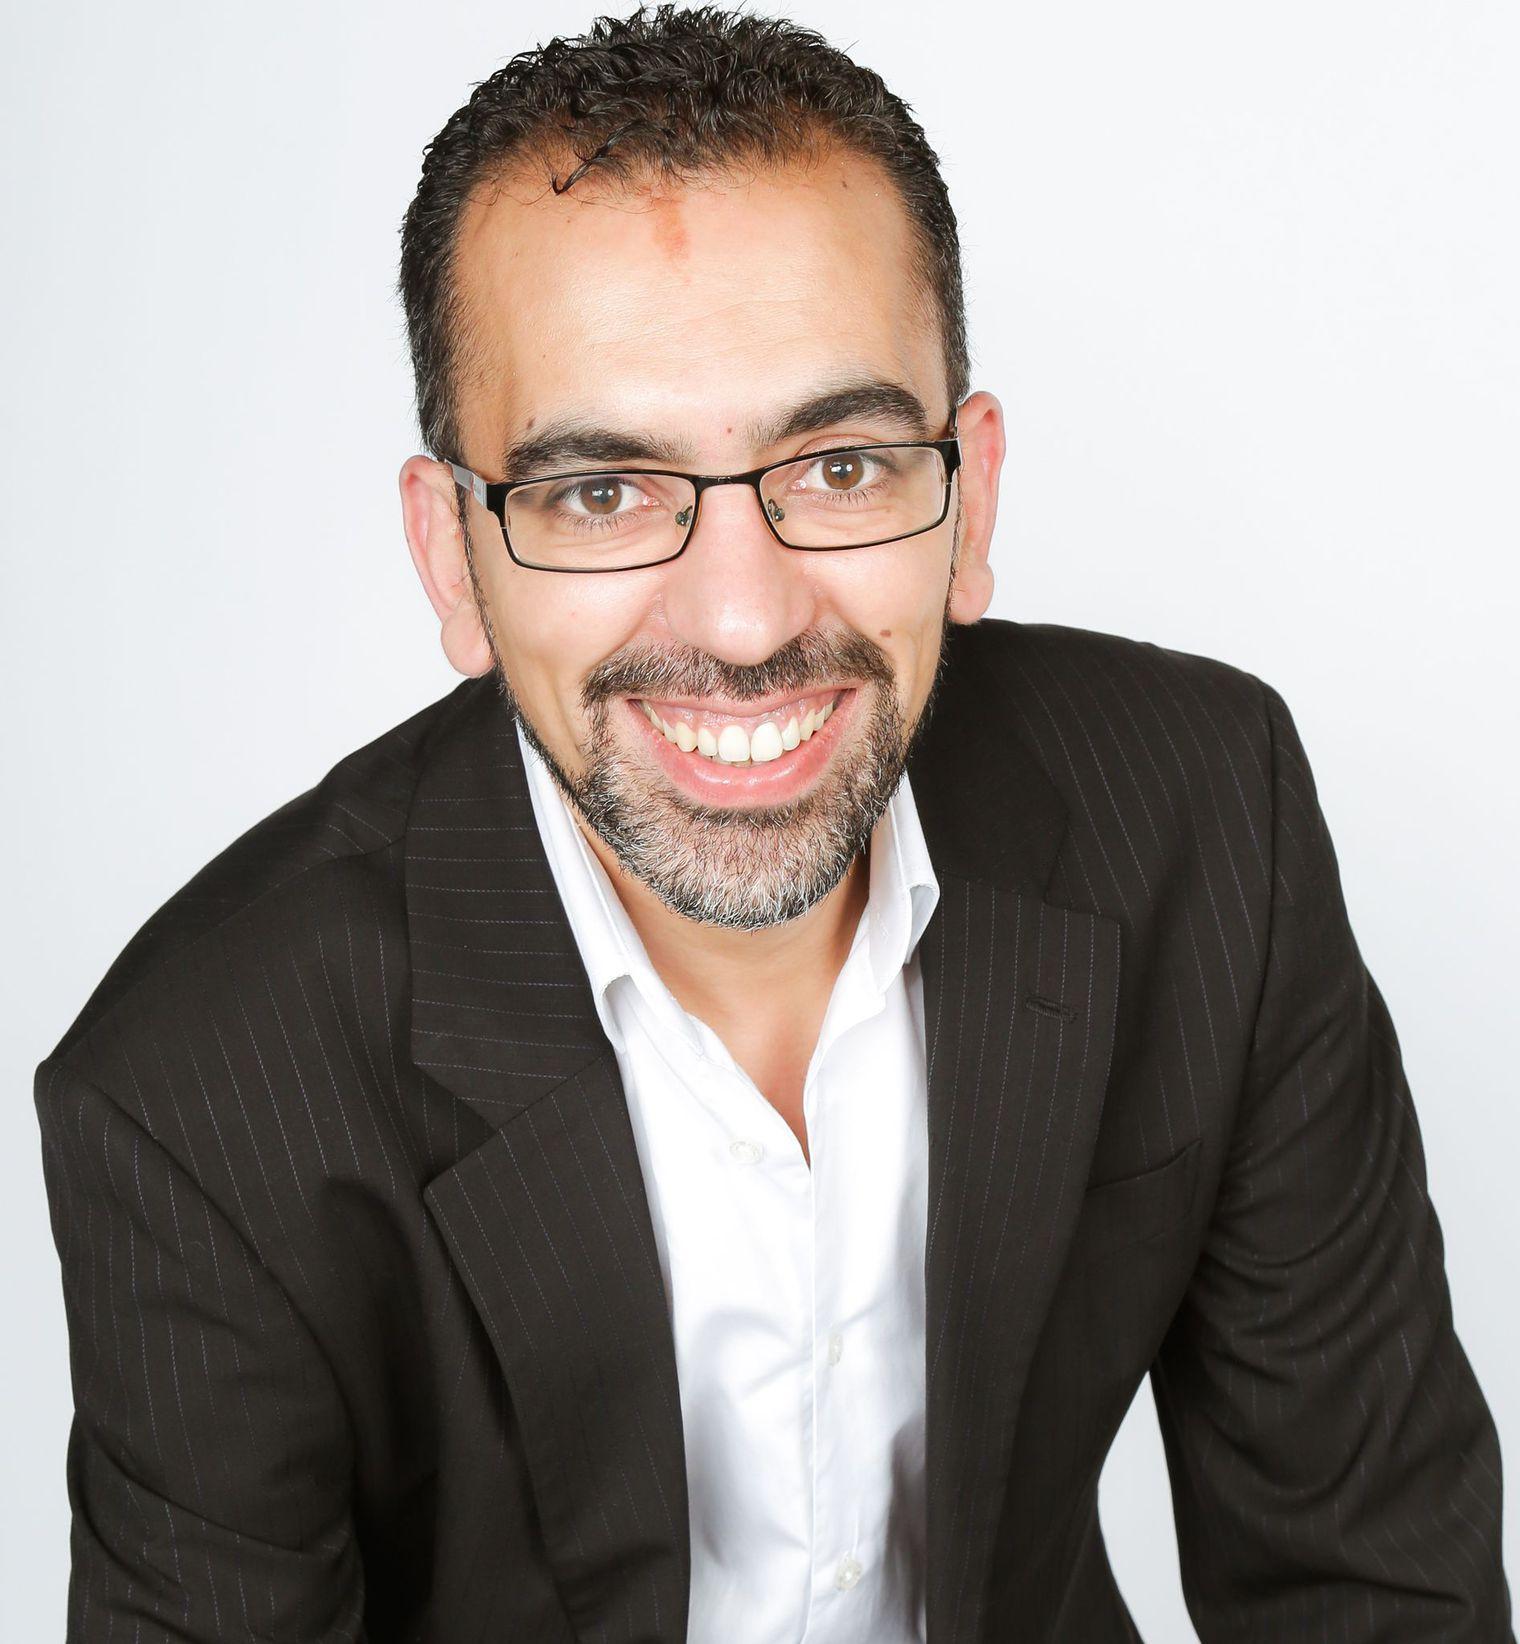 Majid el Jarroudi